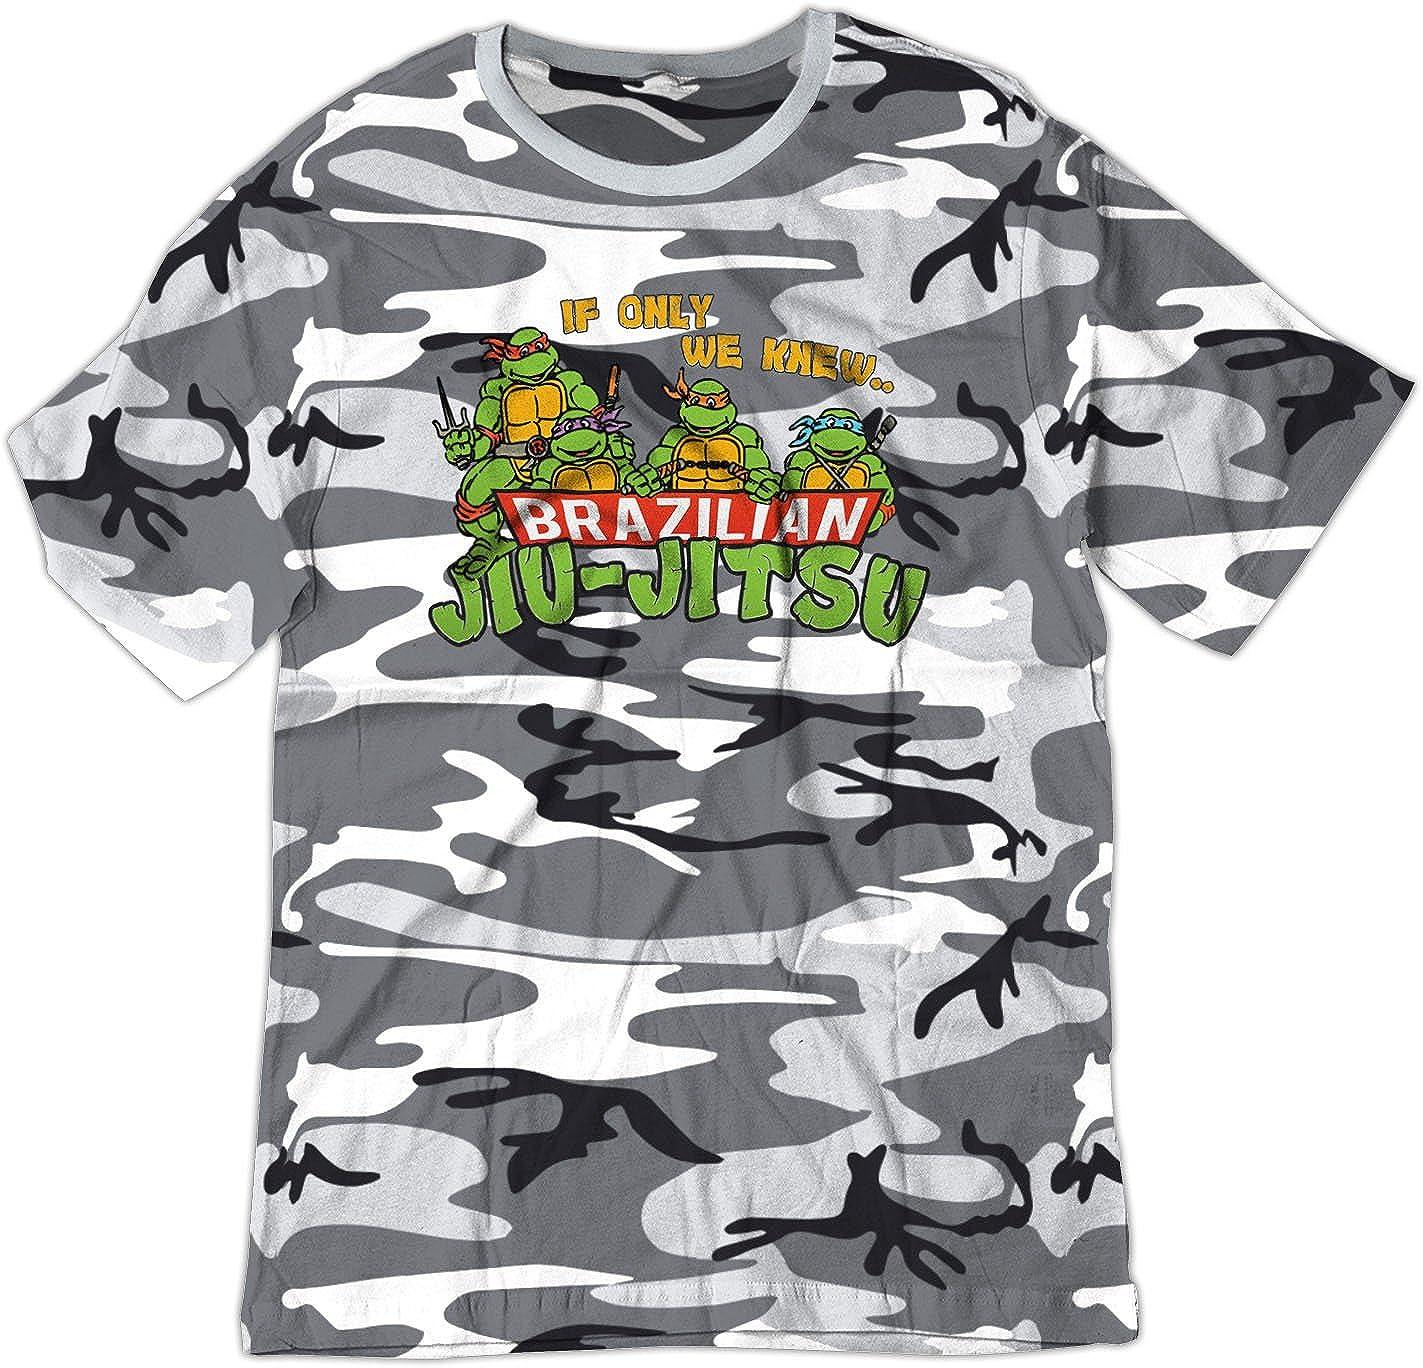 BSW YOUTH If Only We Knew Brazilian Jiu-Jitsu TMNT MMA Shirt 5181-1Y